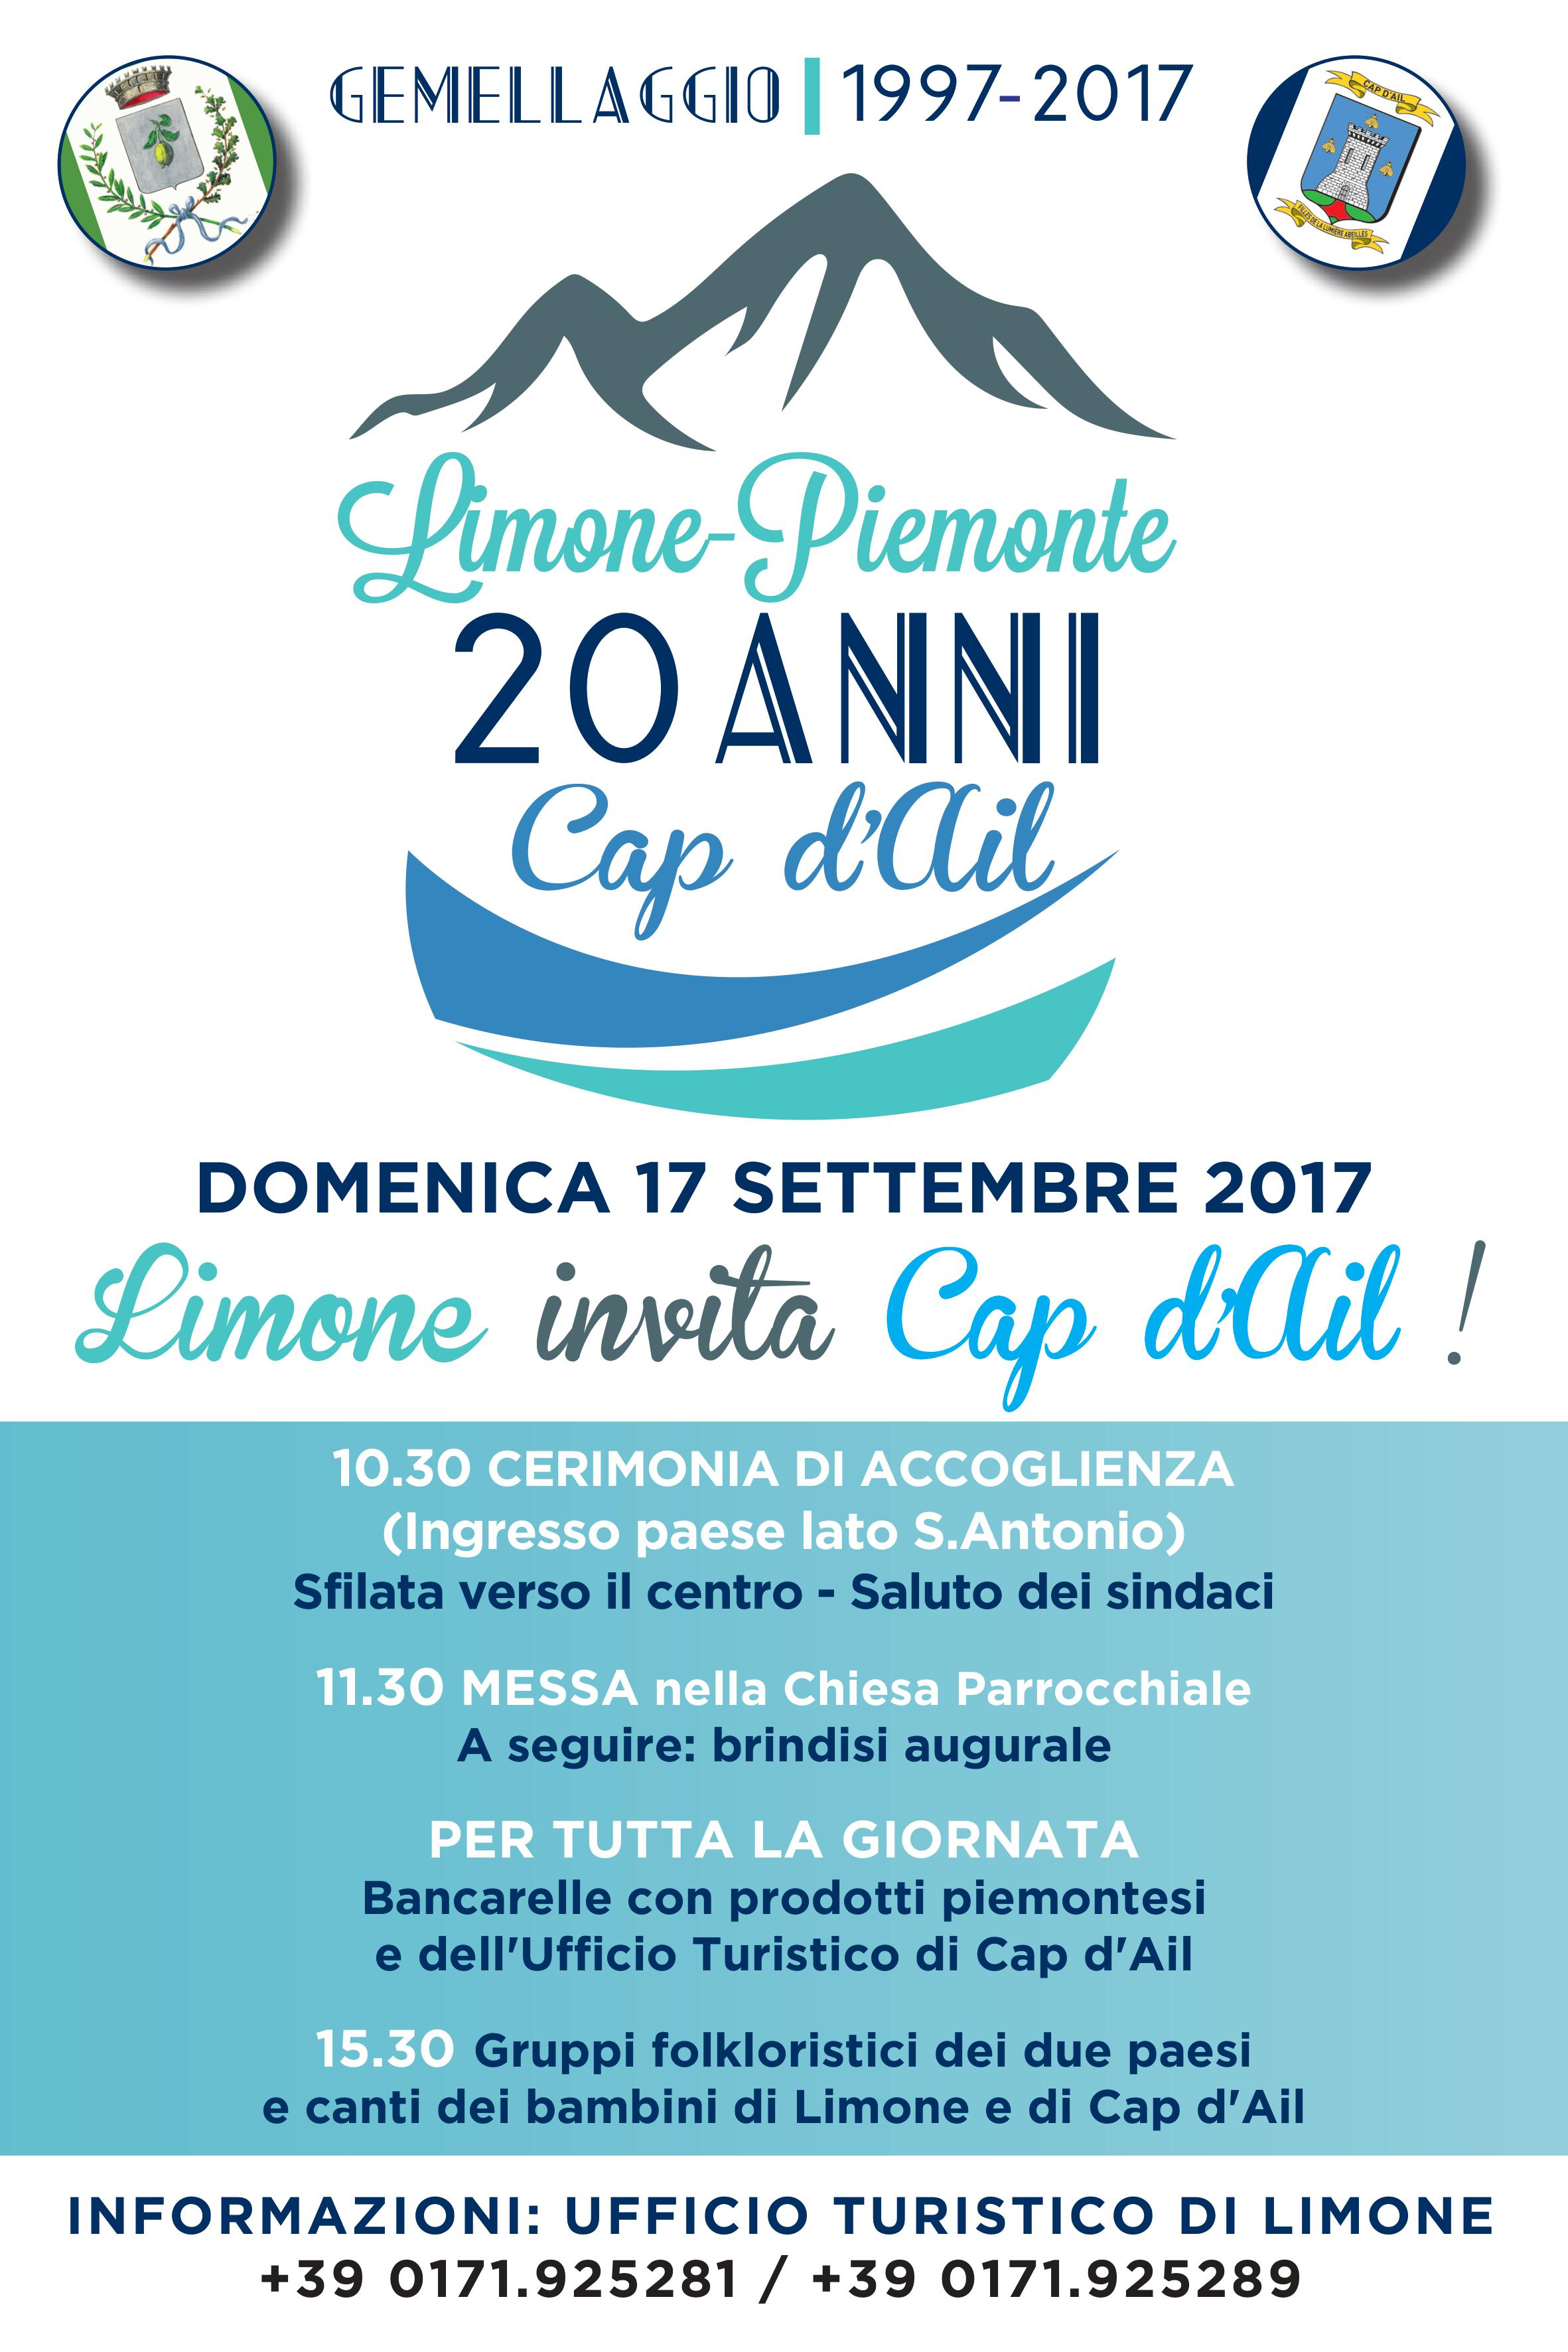 Locandina ventennale gemellaggio Limone Cap dAil